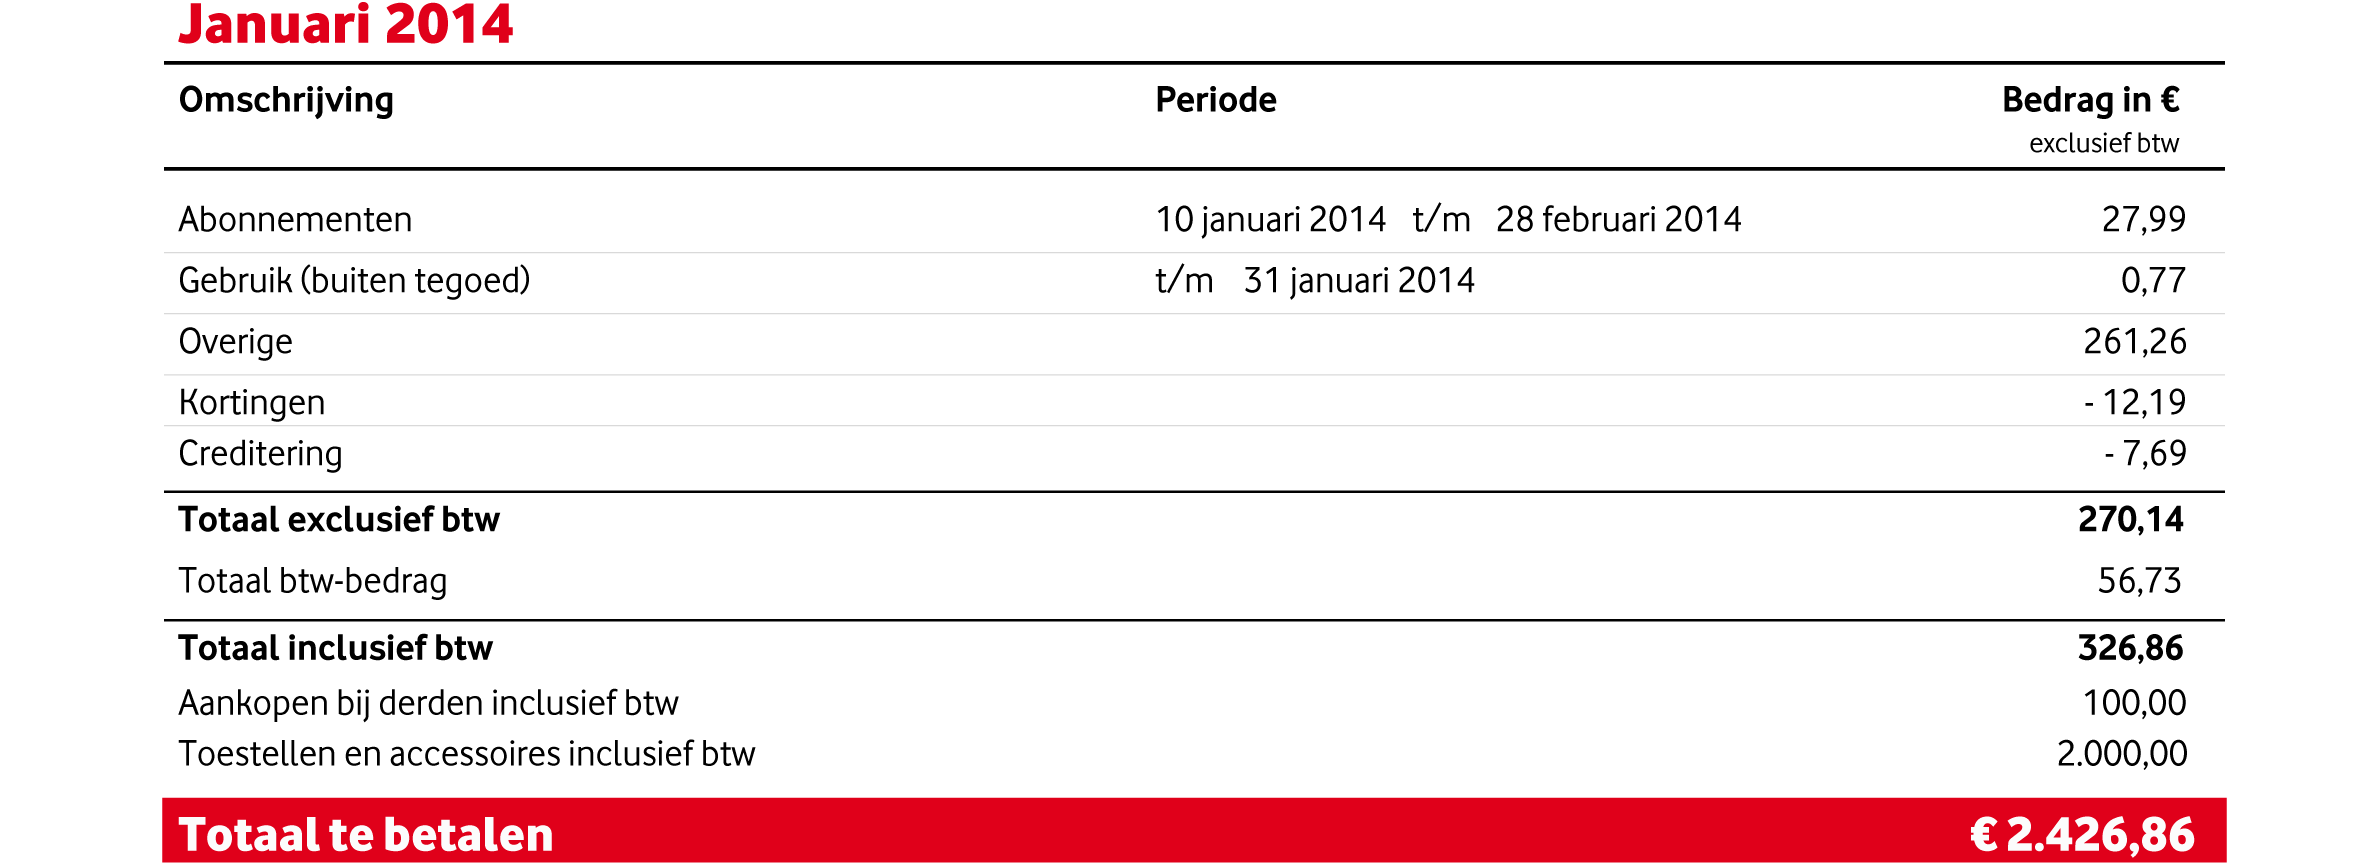 Voorbeeldrekening met uitleg   Vodafone.nl